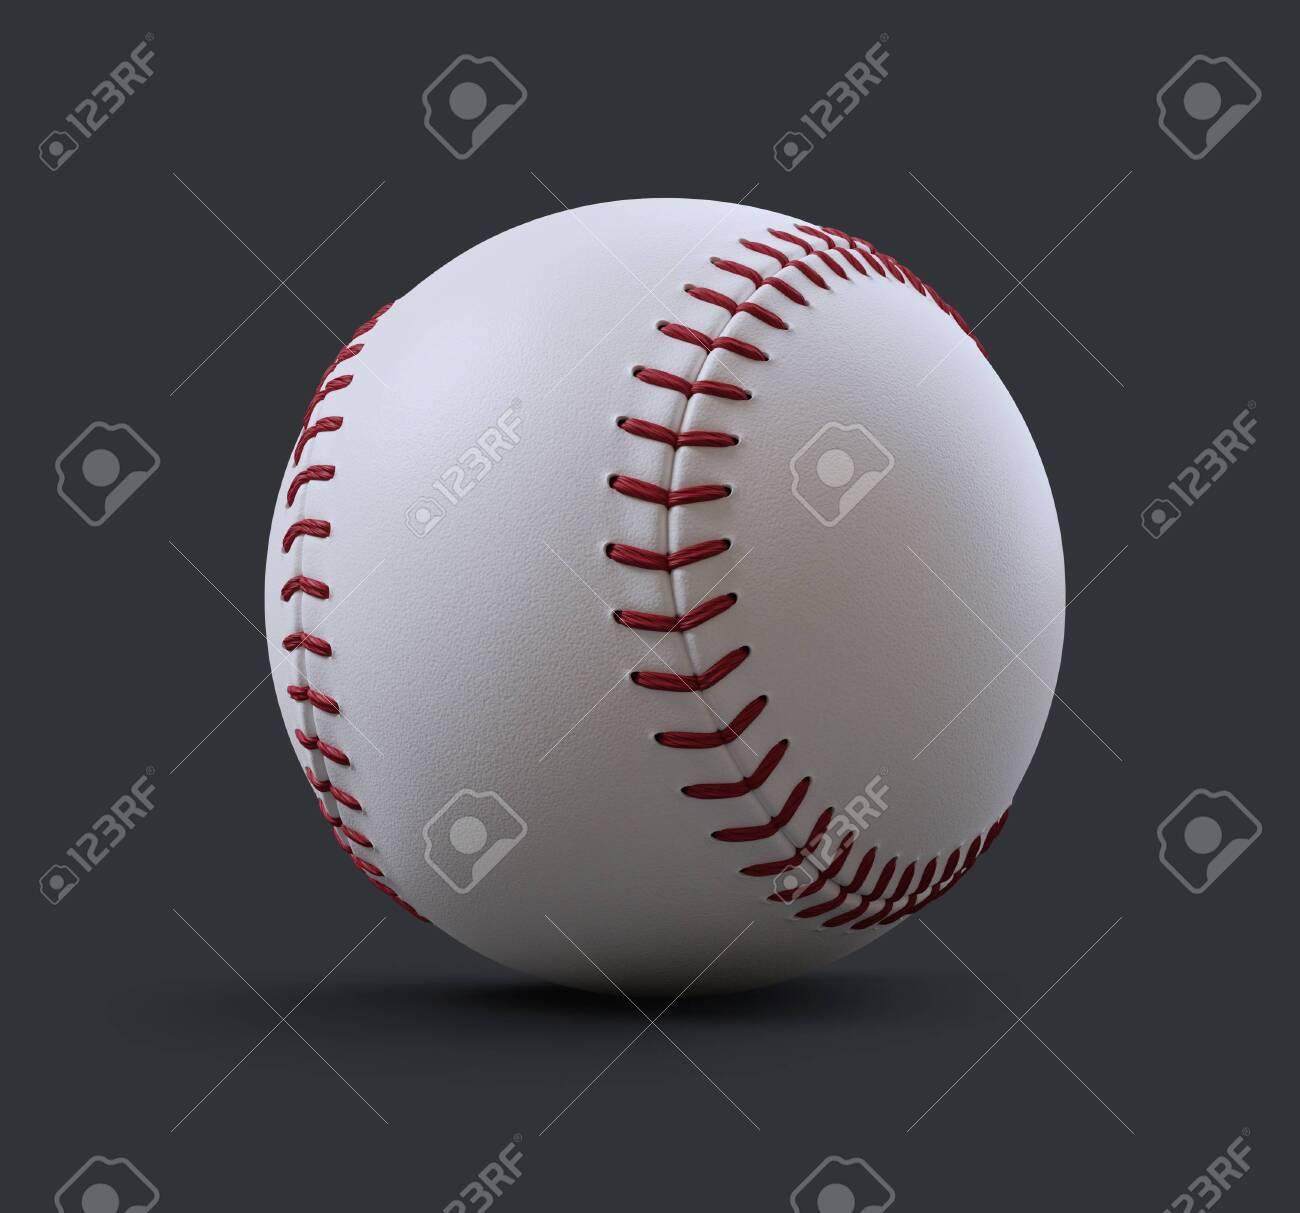 A baseball on a gray background . 3d render illustration - 139807301